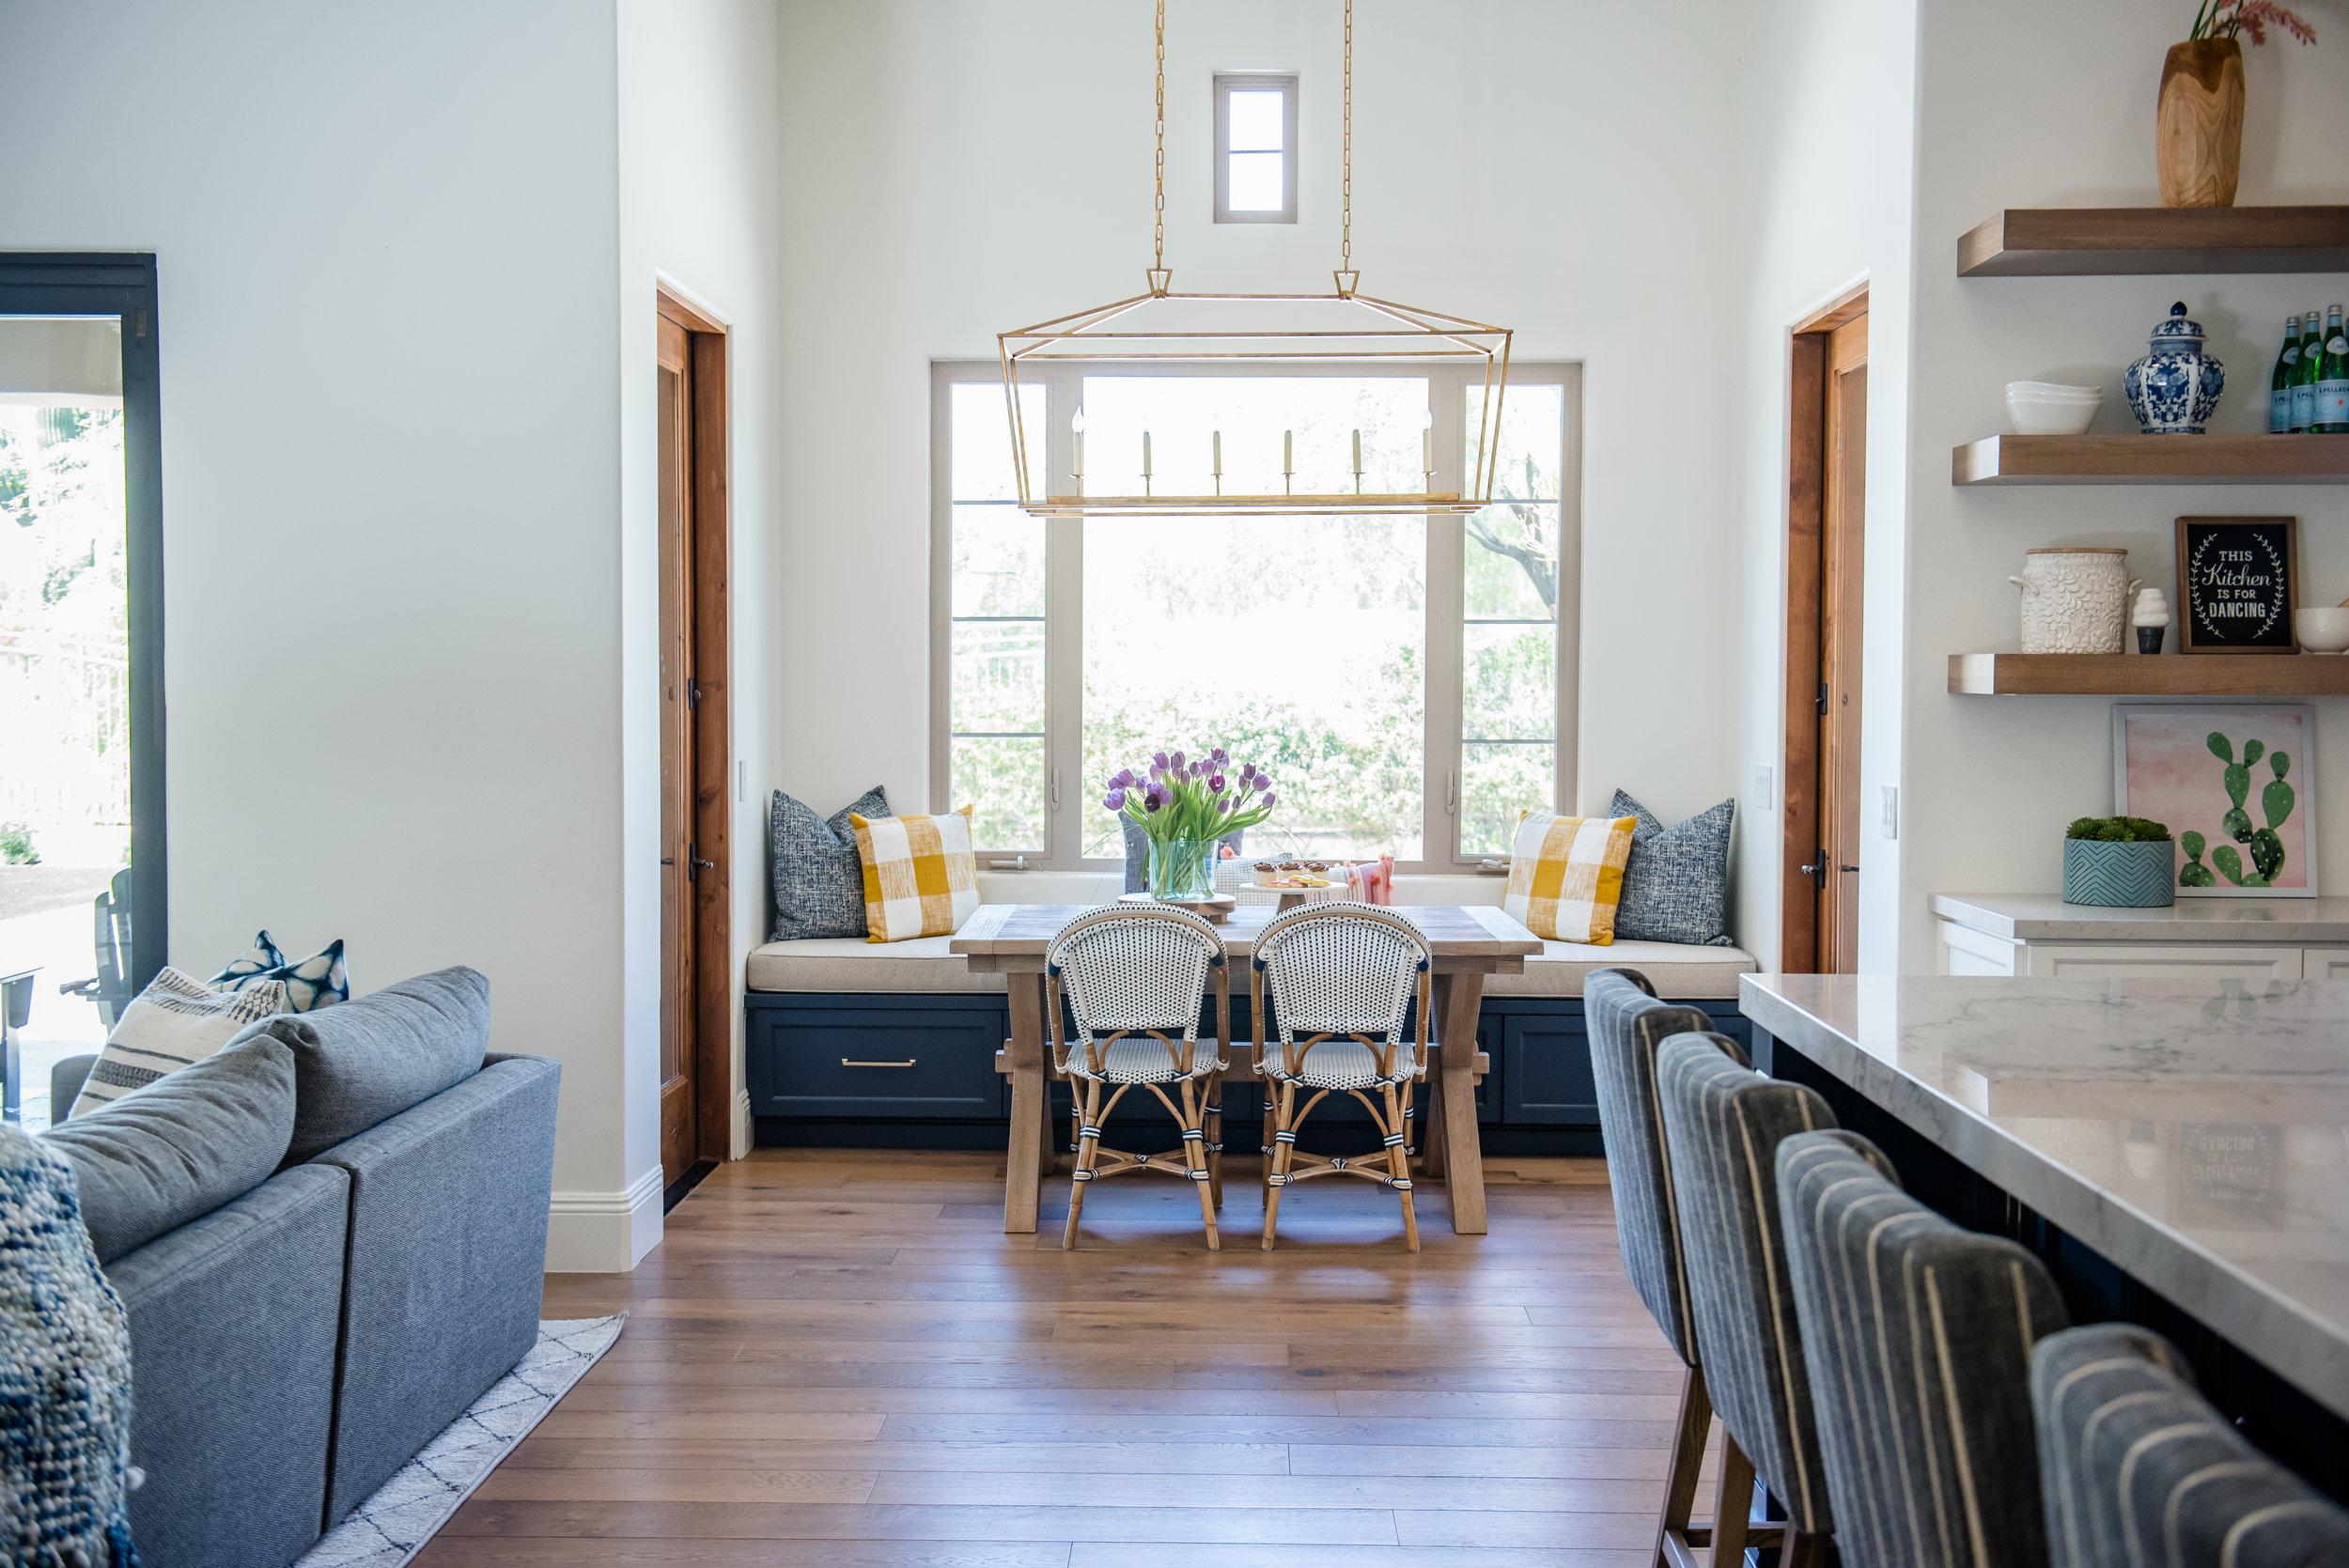 17+windowseat+pillows+kitchen+greatroom+openshelves.jpg